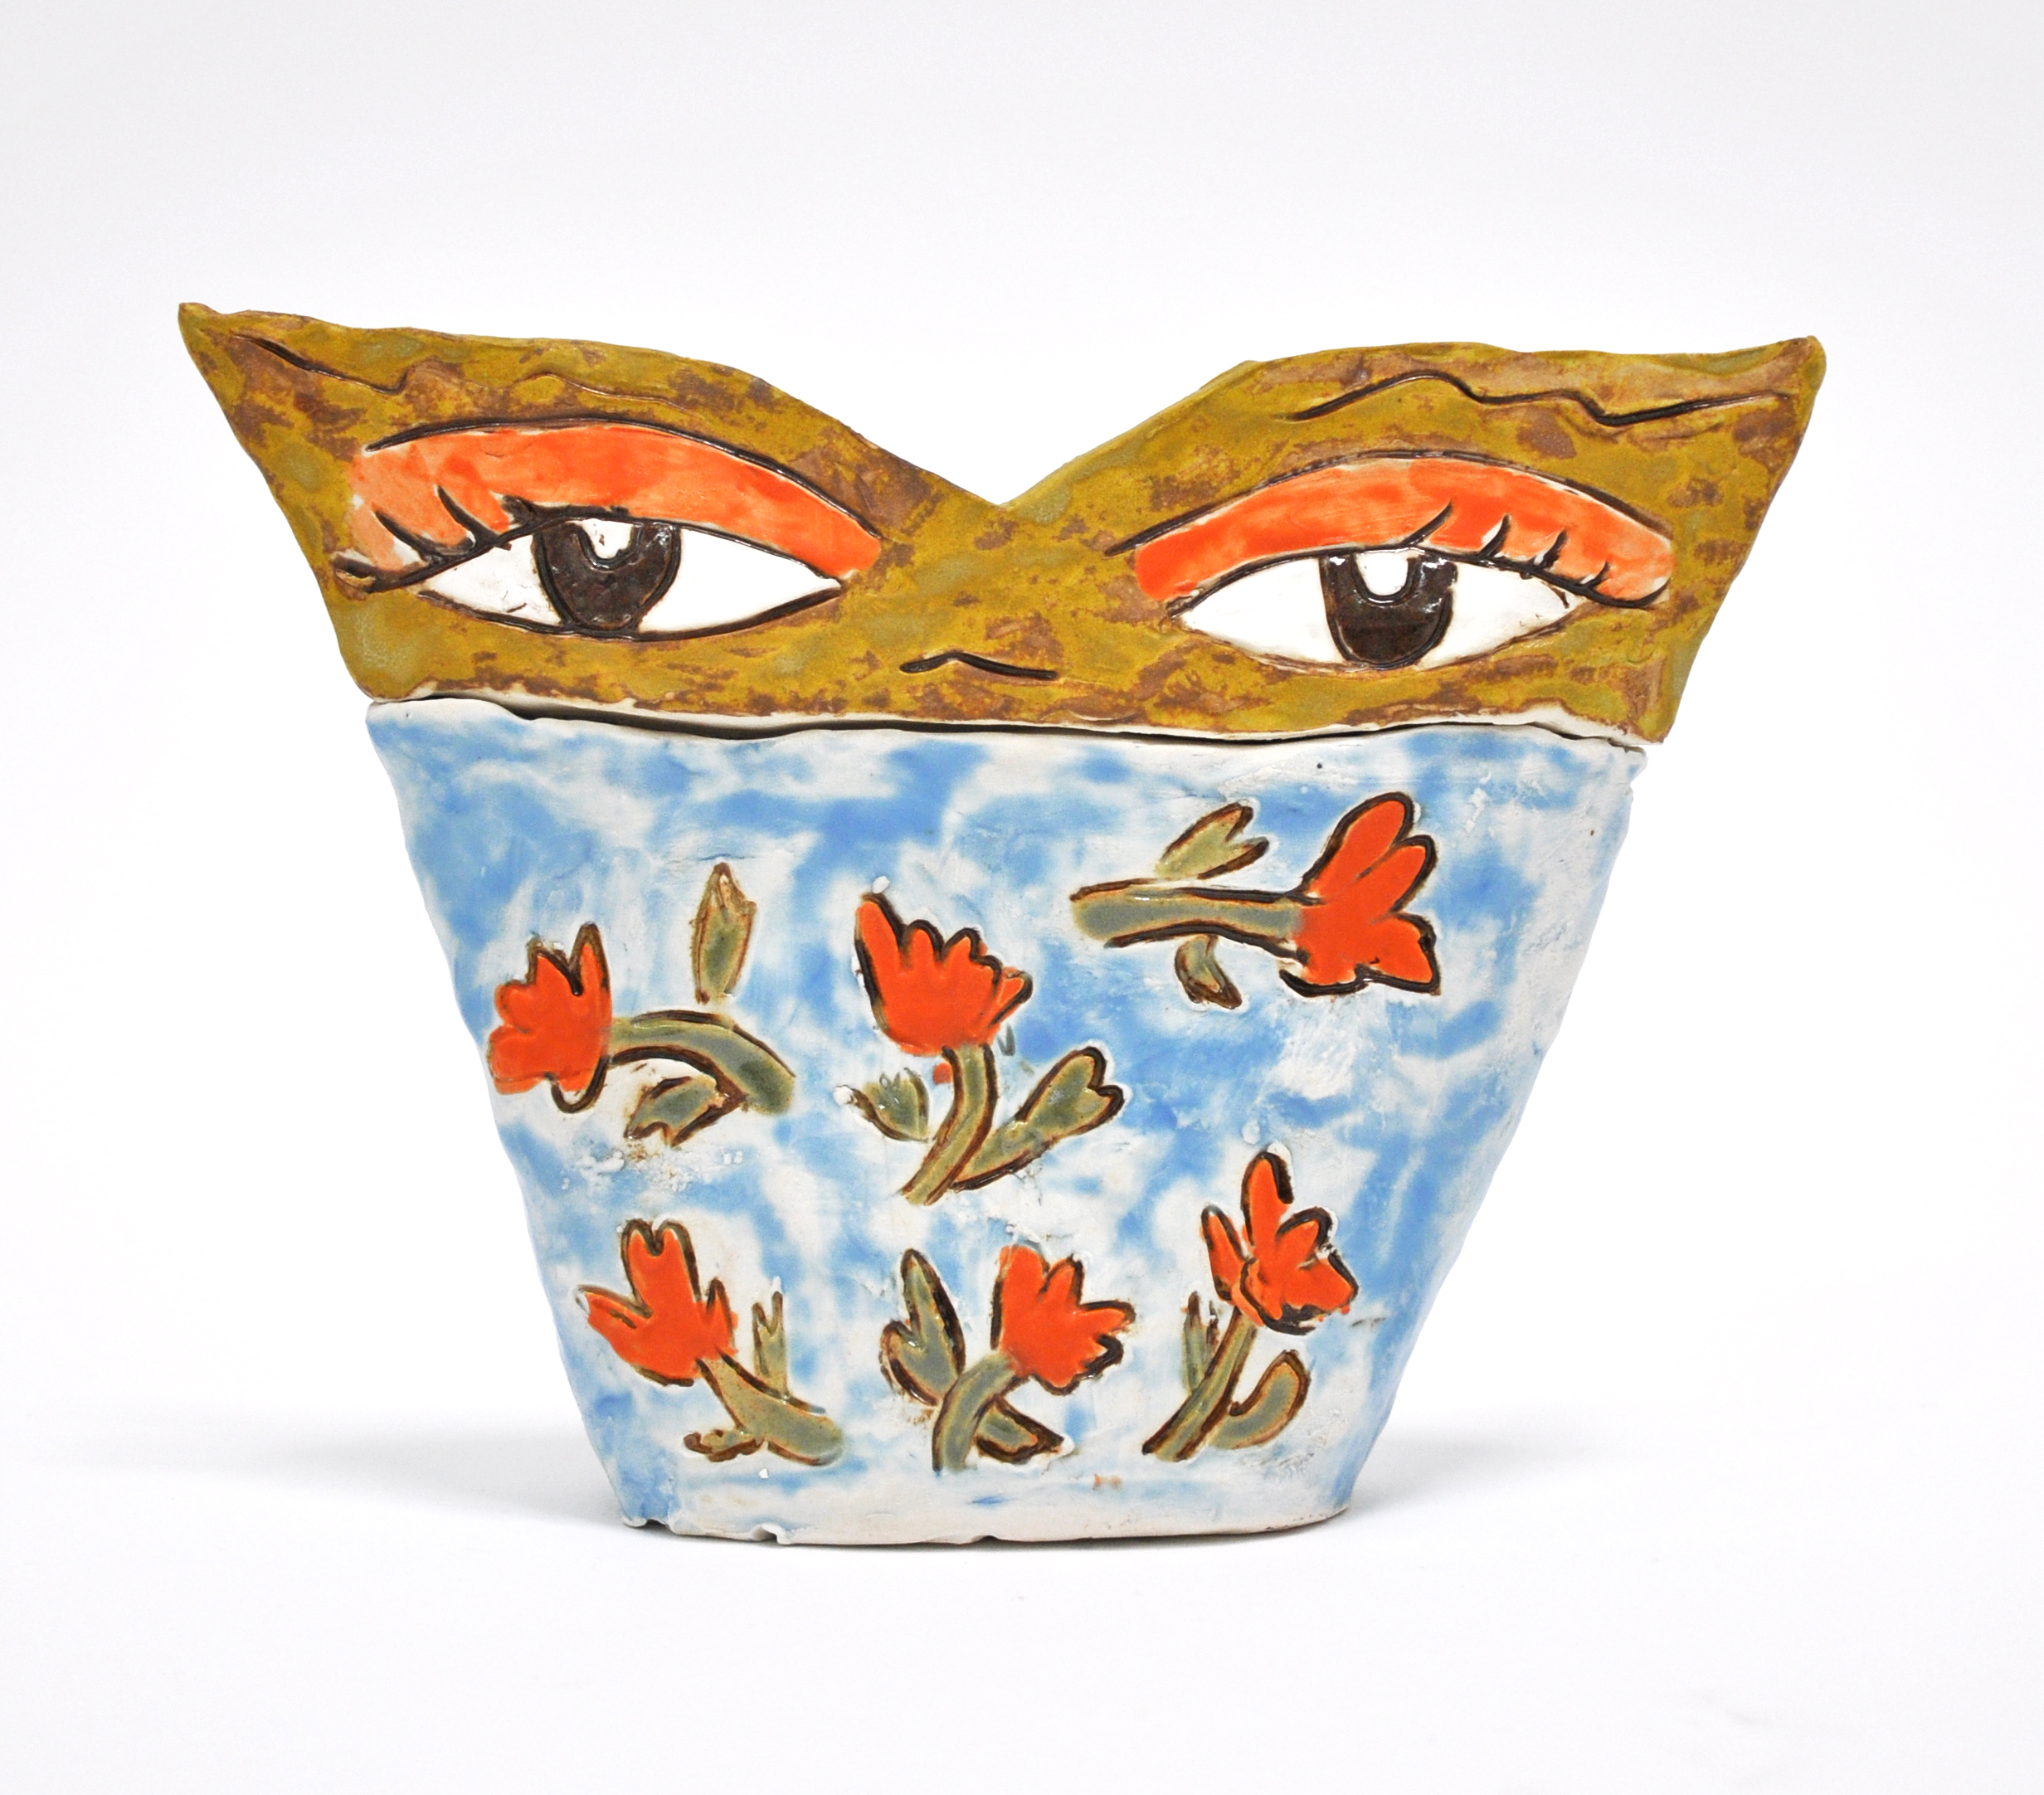 "Maryam Yousif, ""Eye Pot: Puabi's Eyes"", glazed porcelain, 9 x 3 x 6.5 in, 2019, $800"